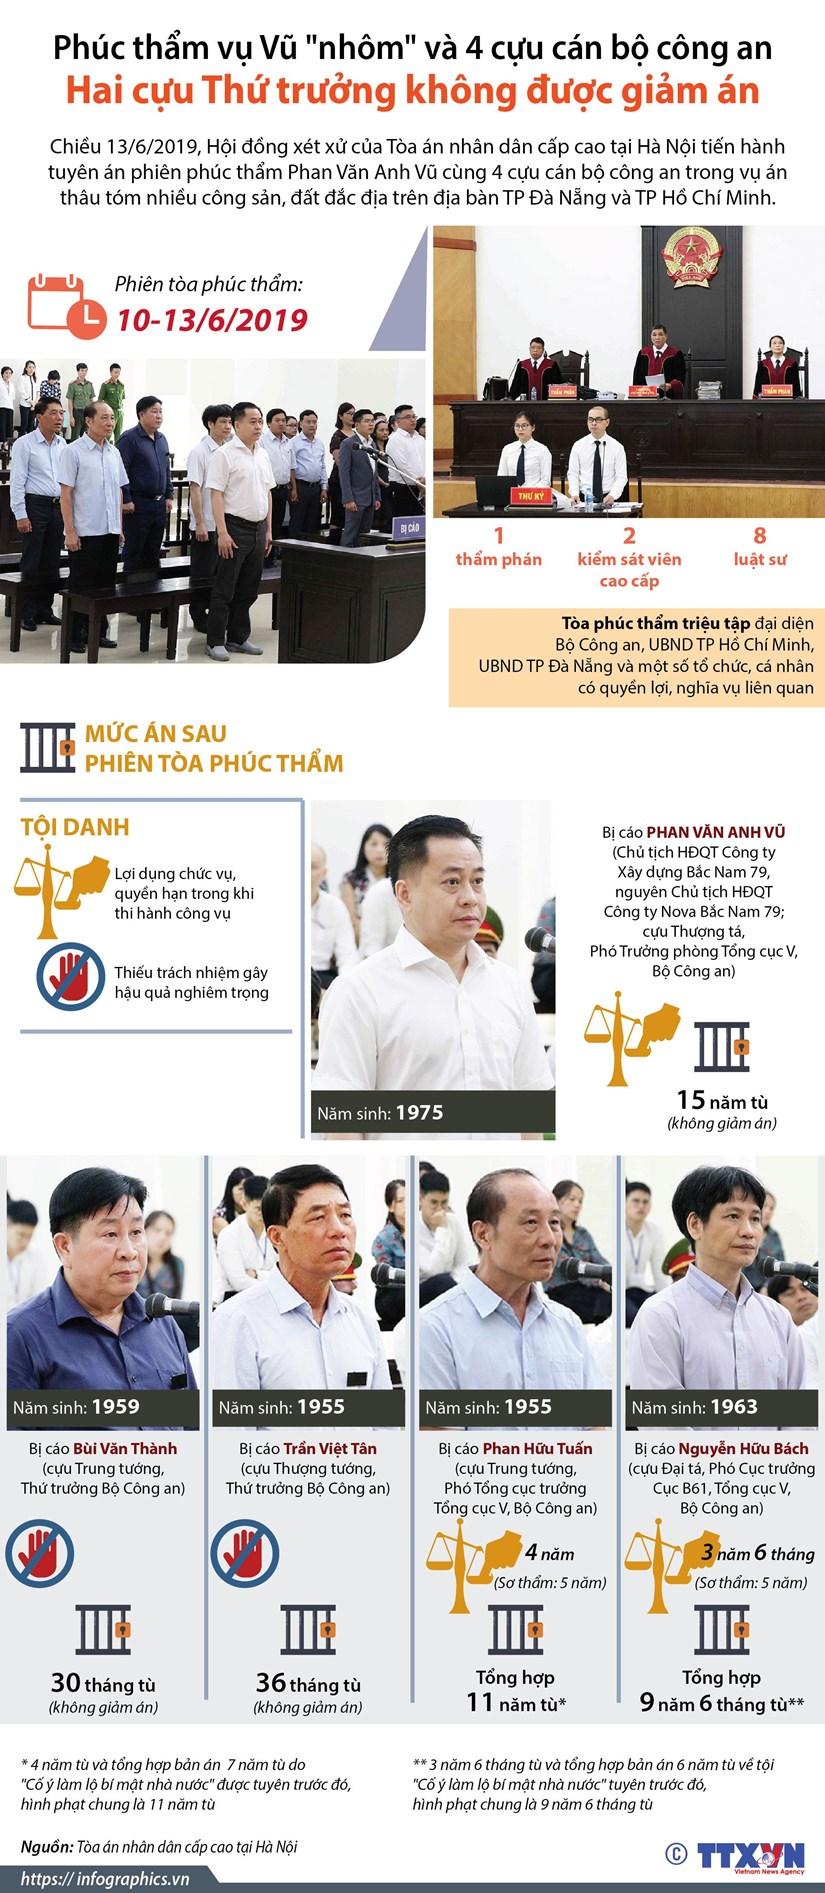 [Infographics] Muc an sau phien toa phuc tham vu Vu 'nhom' hinh anh 1